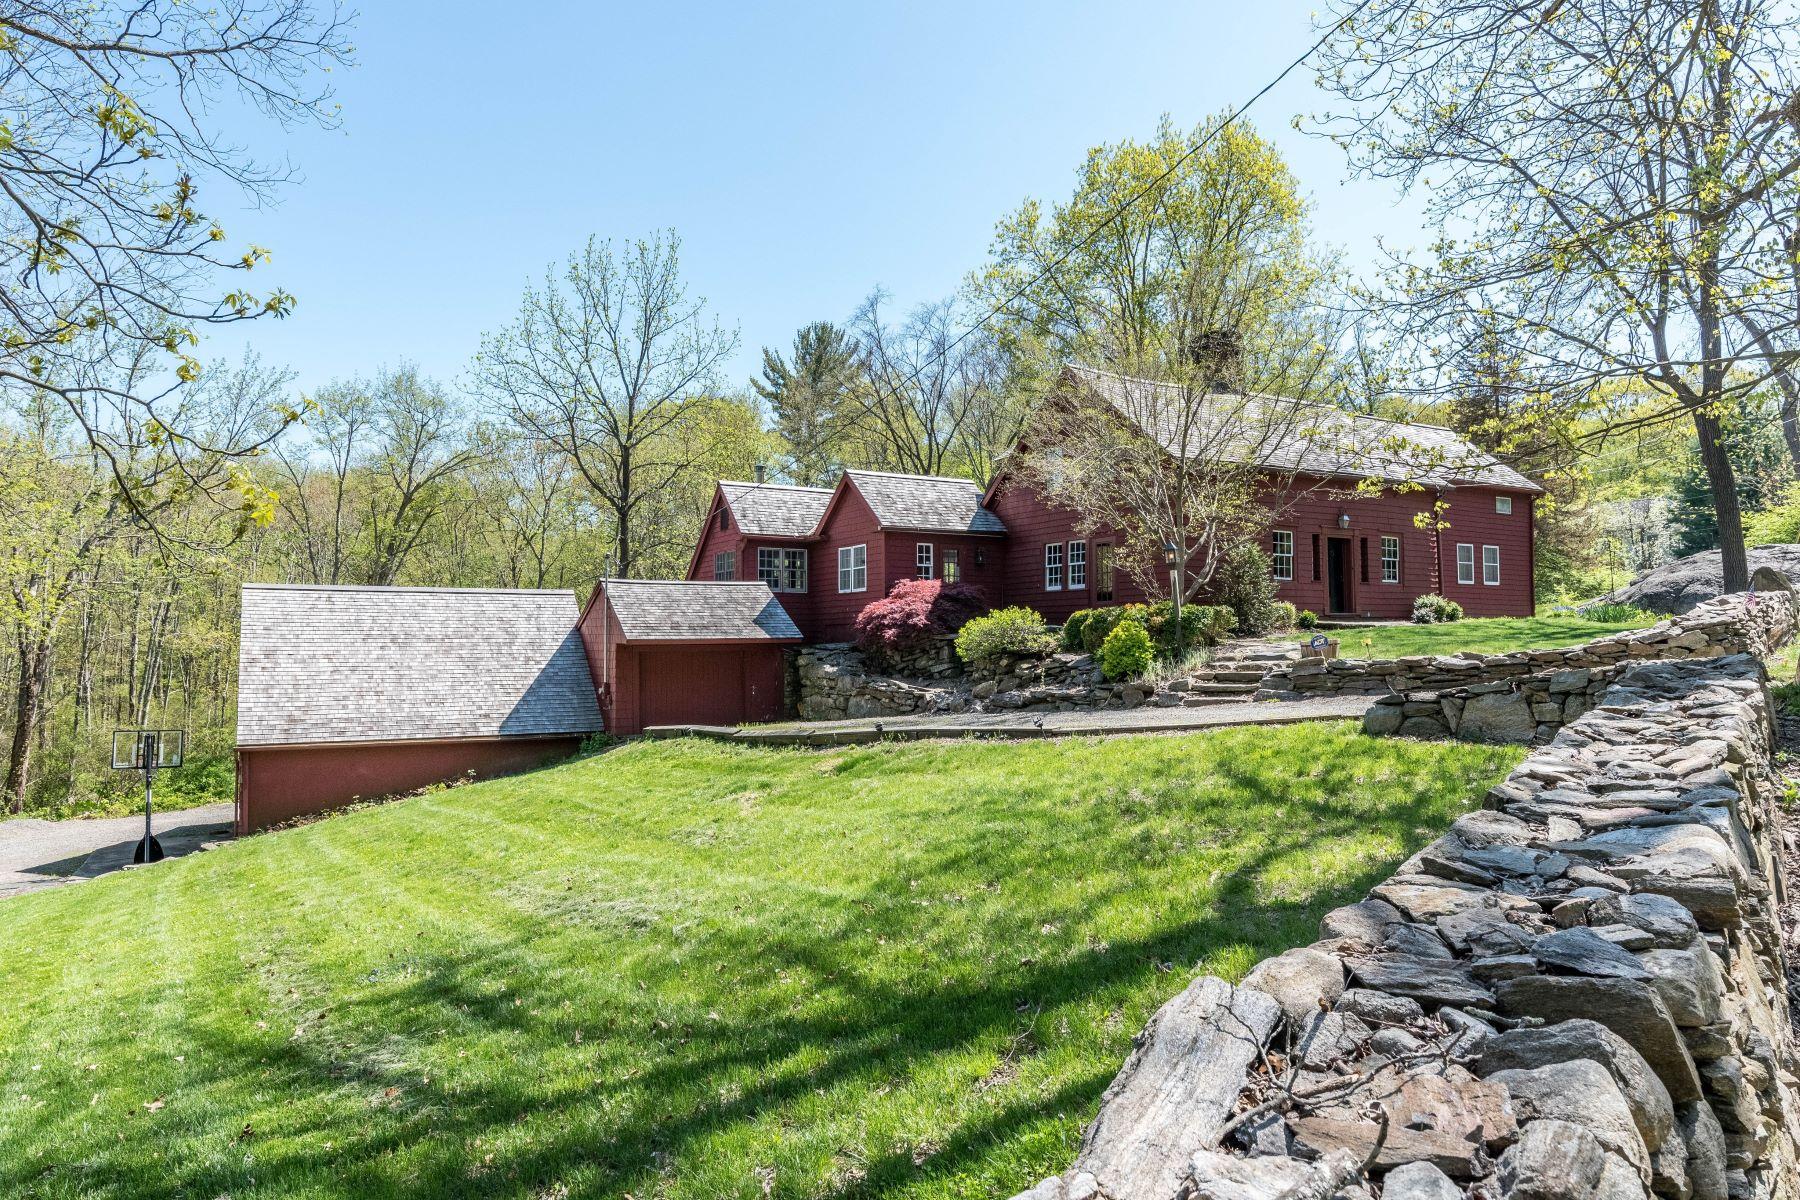 Single Family Homes für Verkauf beim Over 300 Years Of Connecticut History 43 Old Easton Turnpike, Weston, Connecticut 06883 Vereinigte Staaten